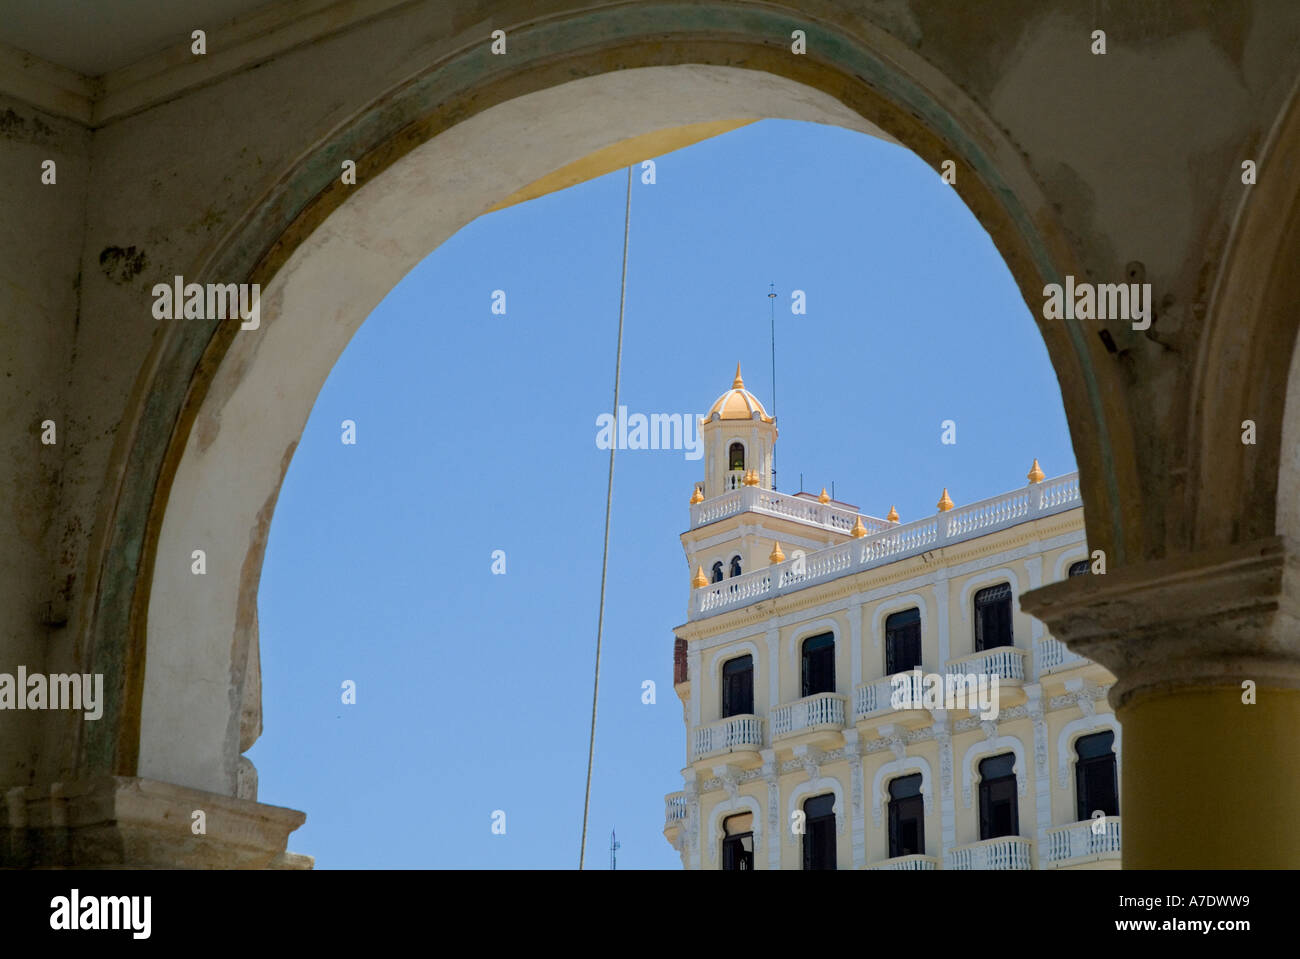 Camere Oscure Bologna : Camera oscura stock photos & camera oscura stock images alamy